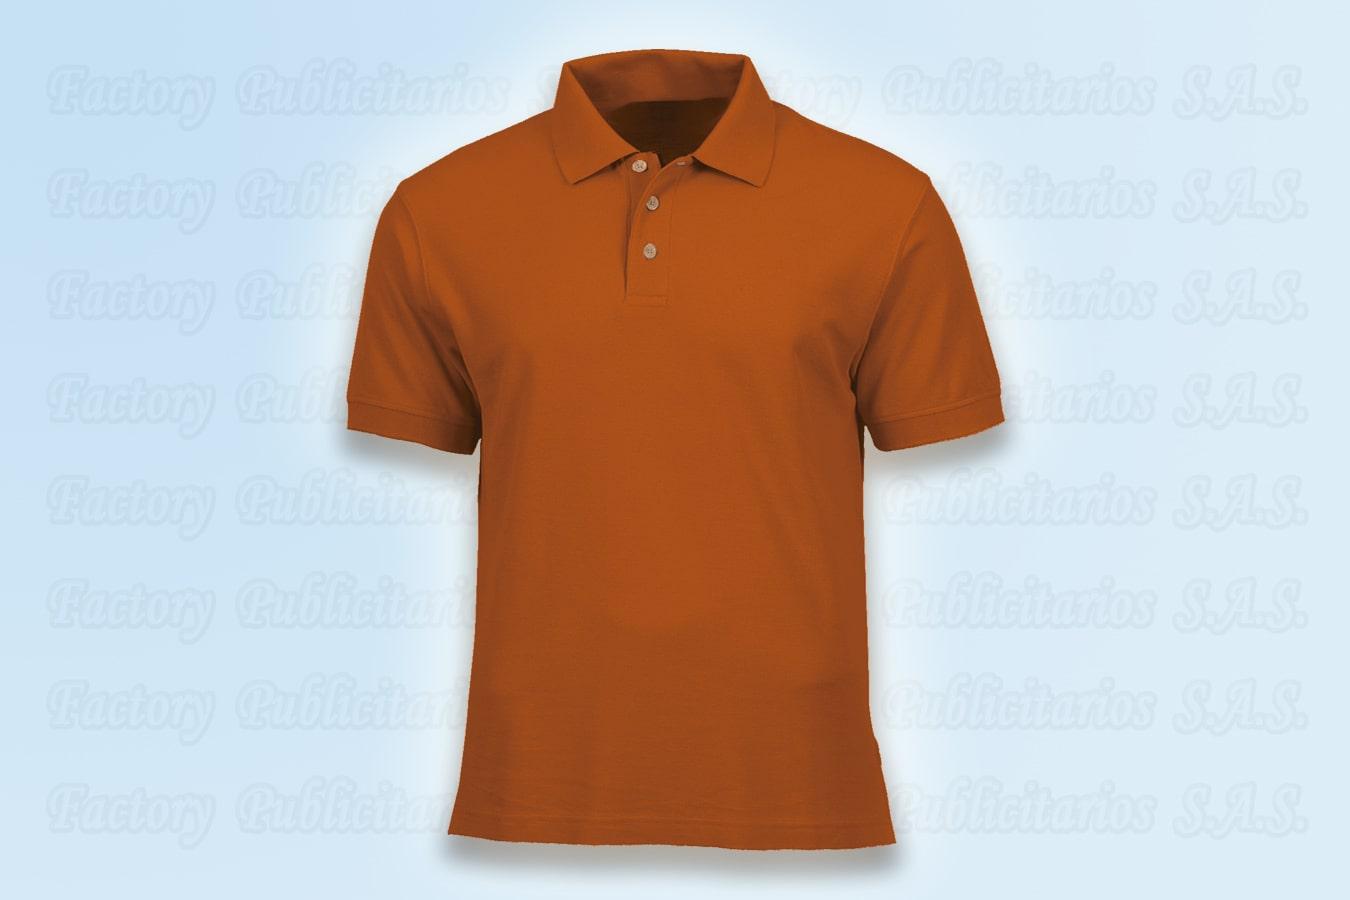 Camisas polo naranja al por mayor